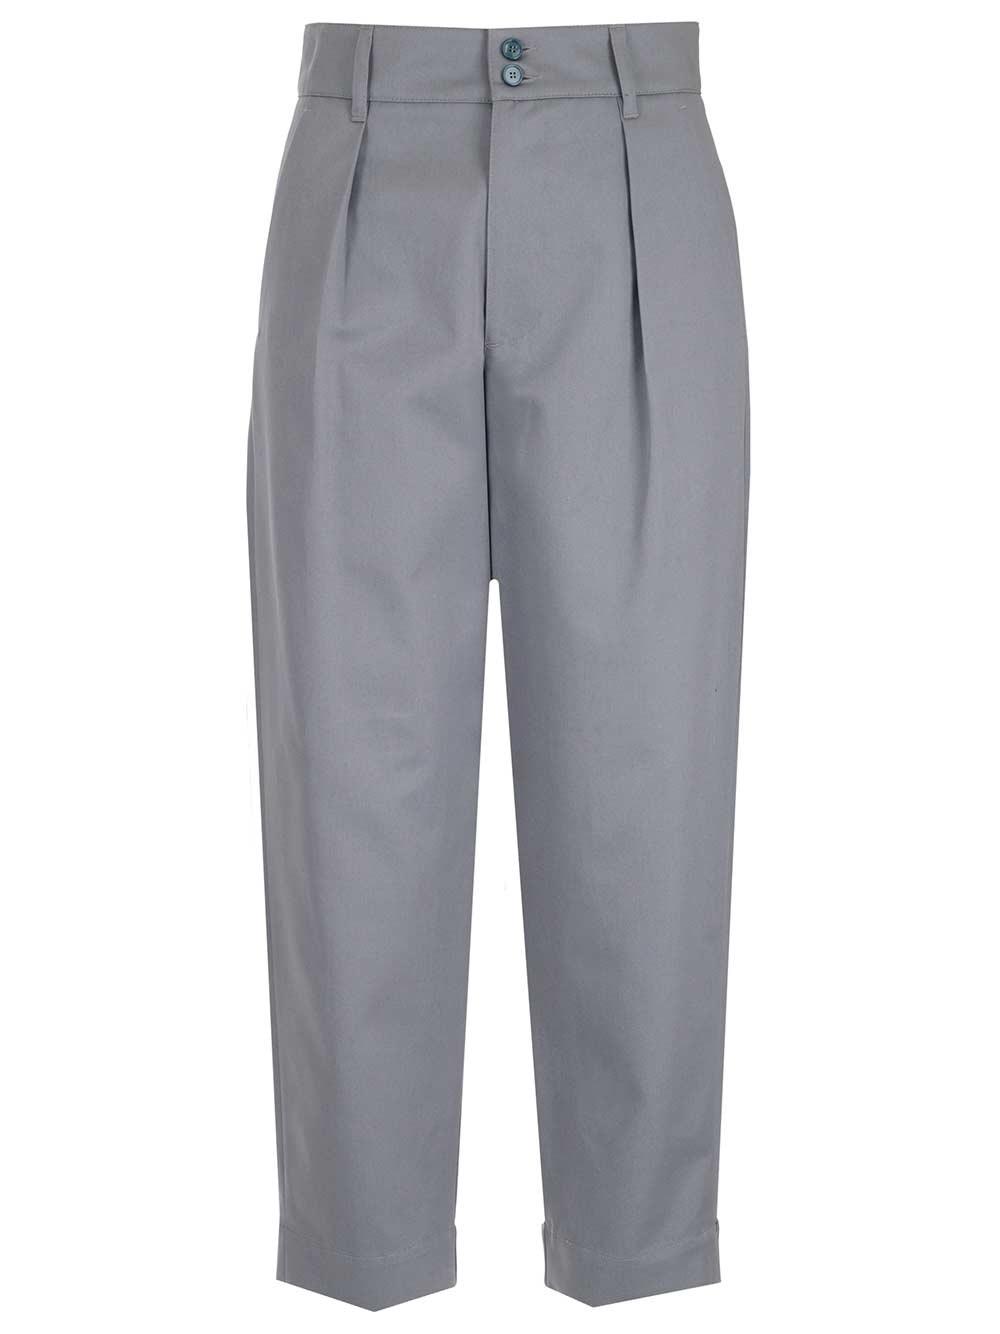 BARENA VENEZIA Cropped Trousers